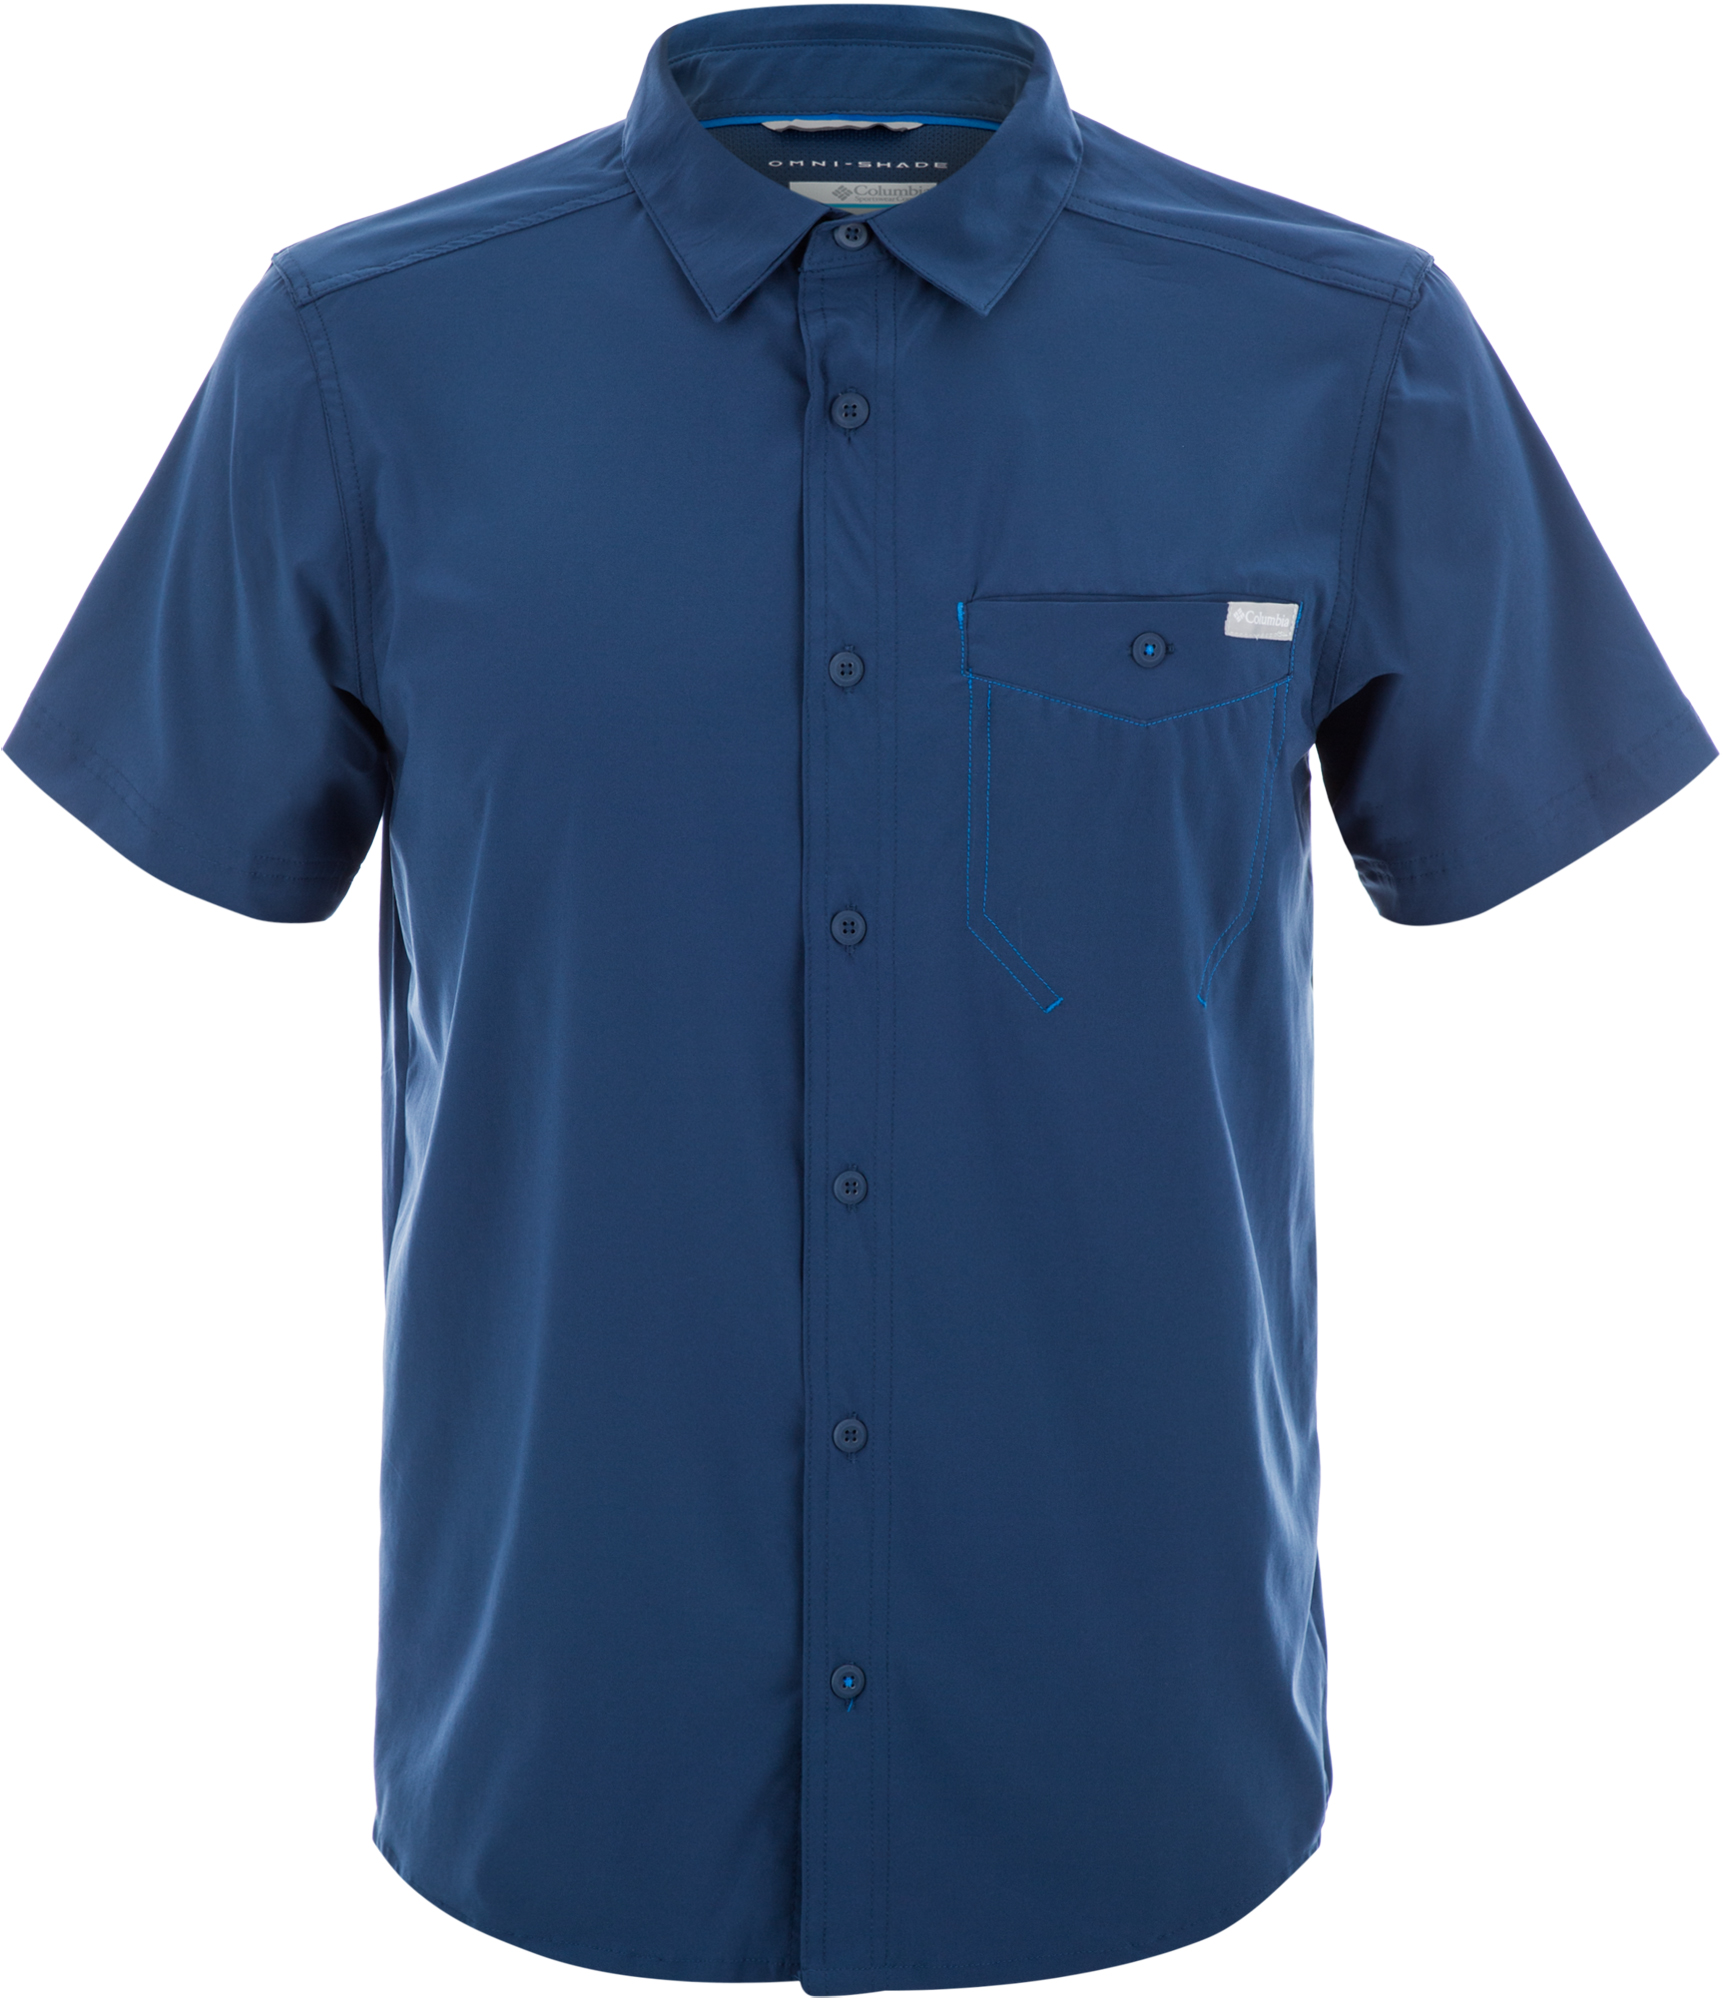 цена на Columbia Рубашка мужская Columbia Triple Canyon Solid, размер 56-58